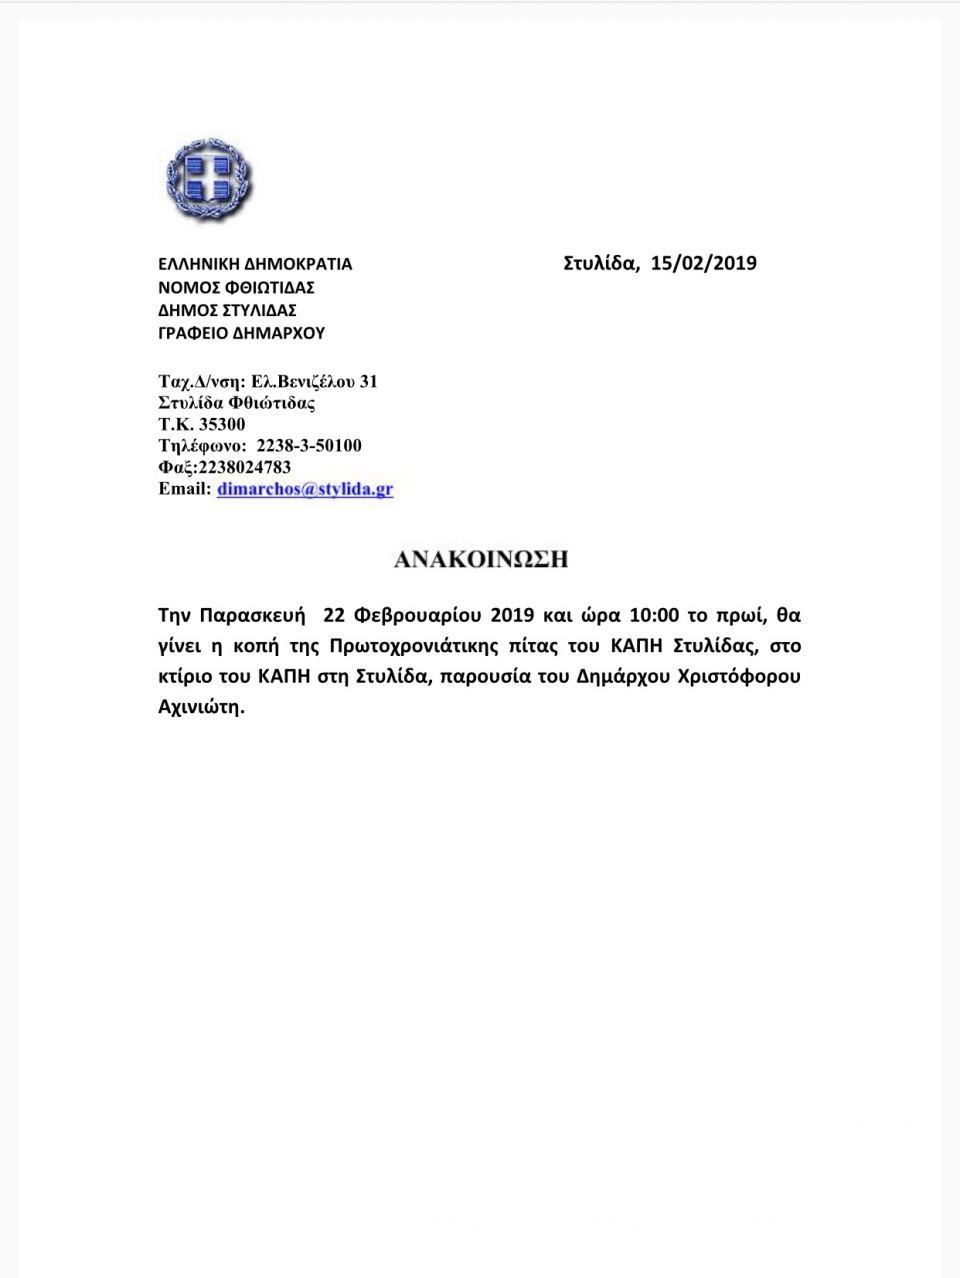 img 5283 ΣΤΥΛΙΔΑ ΚΟΠΗ ΠΡΩΤΟΧΡΟΝΙΑΤΙΚΗΣ ΠΙΤΑΣ ΚΑΠΗ ΣΤΥΛΙΔΑΣ